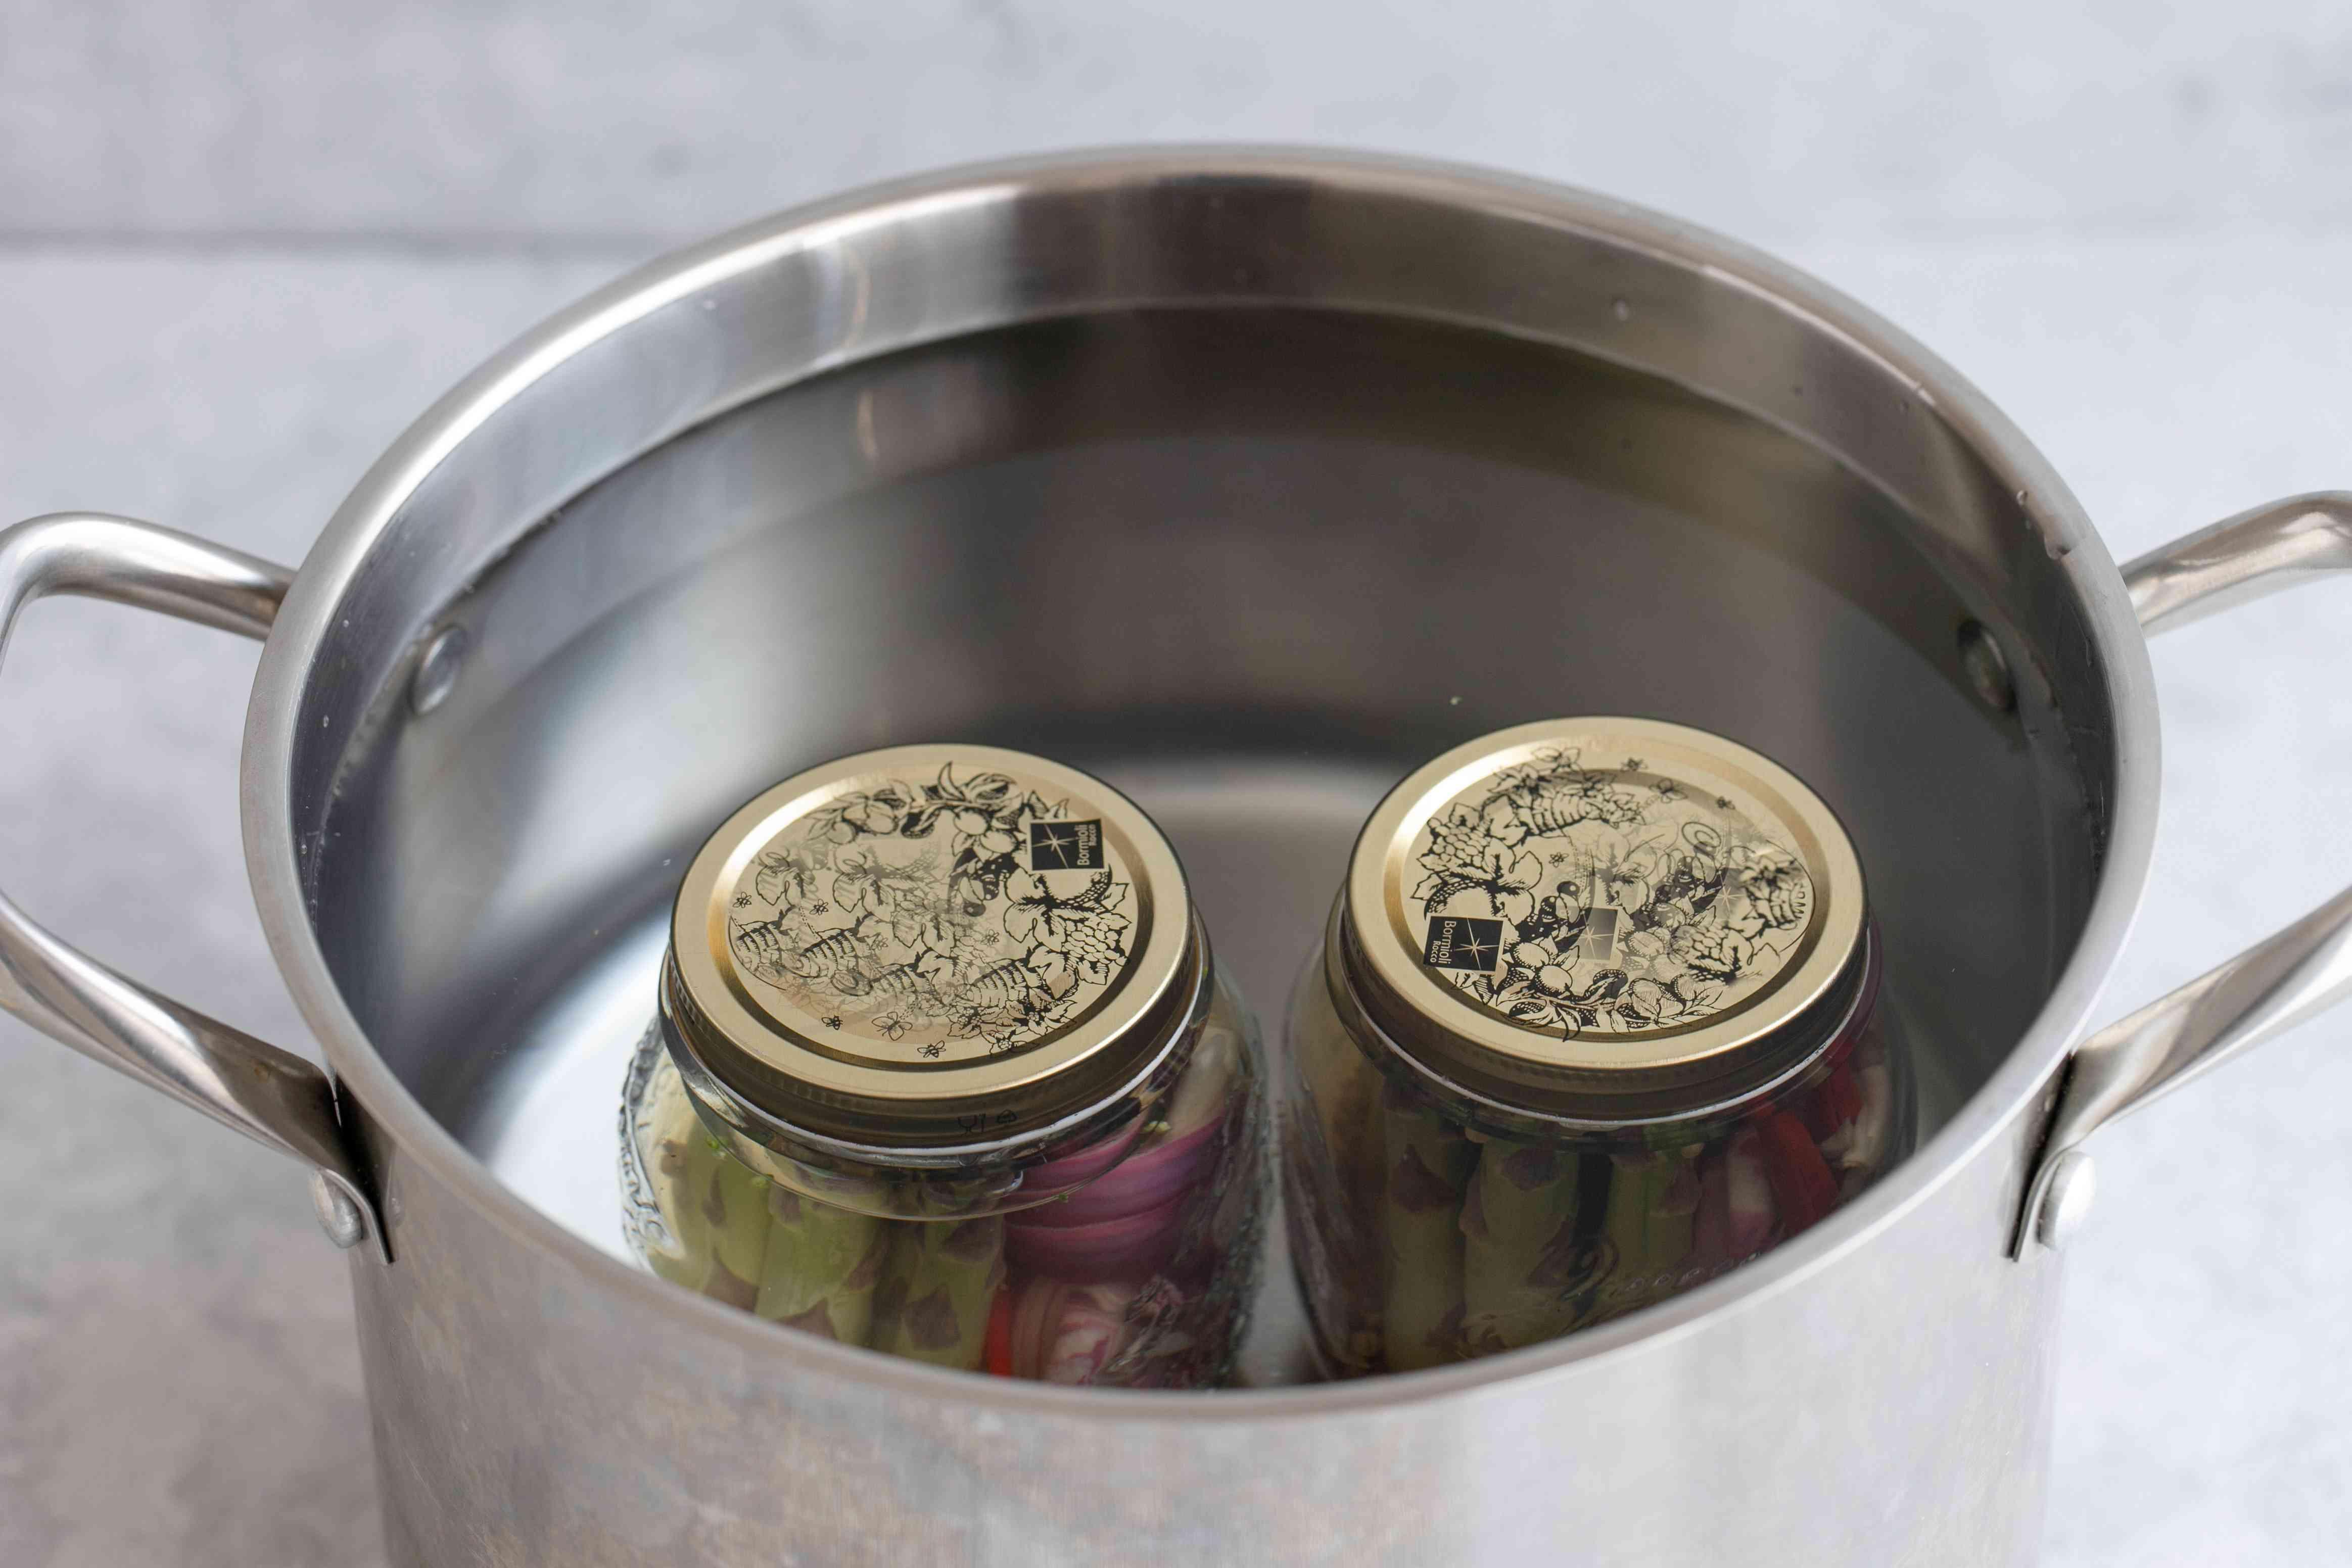 Jar of asparagus